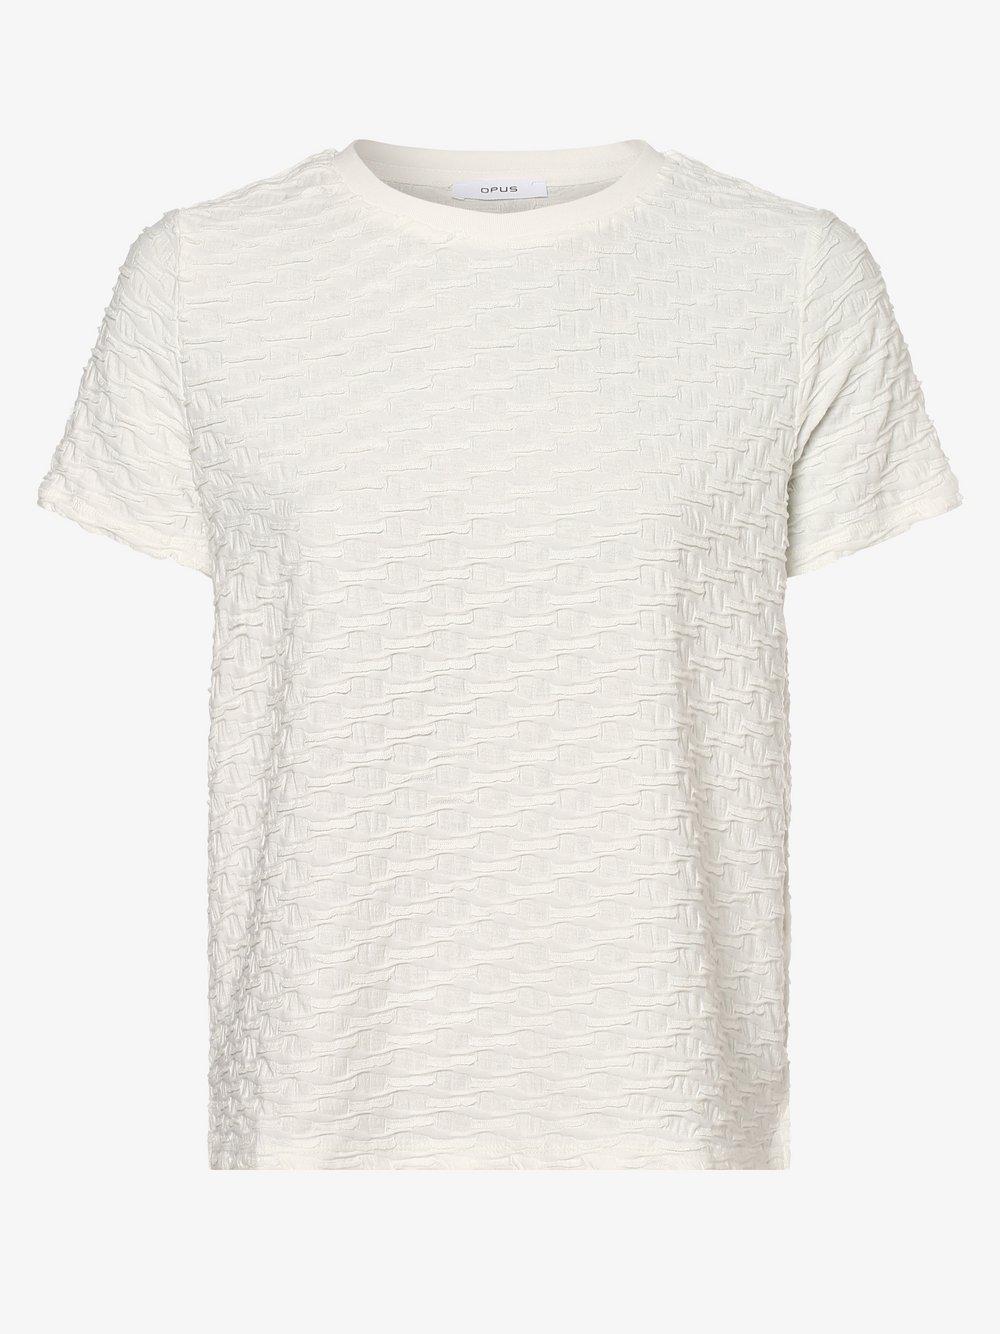 Opus - Koszulka damska – Sanny, beżowy